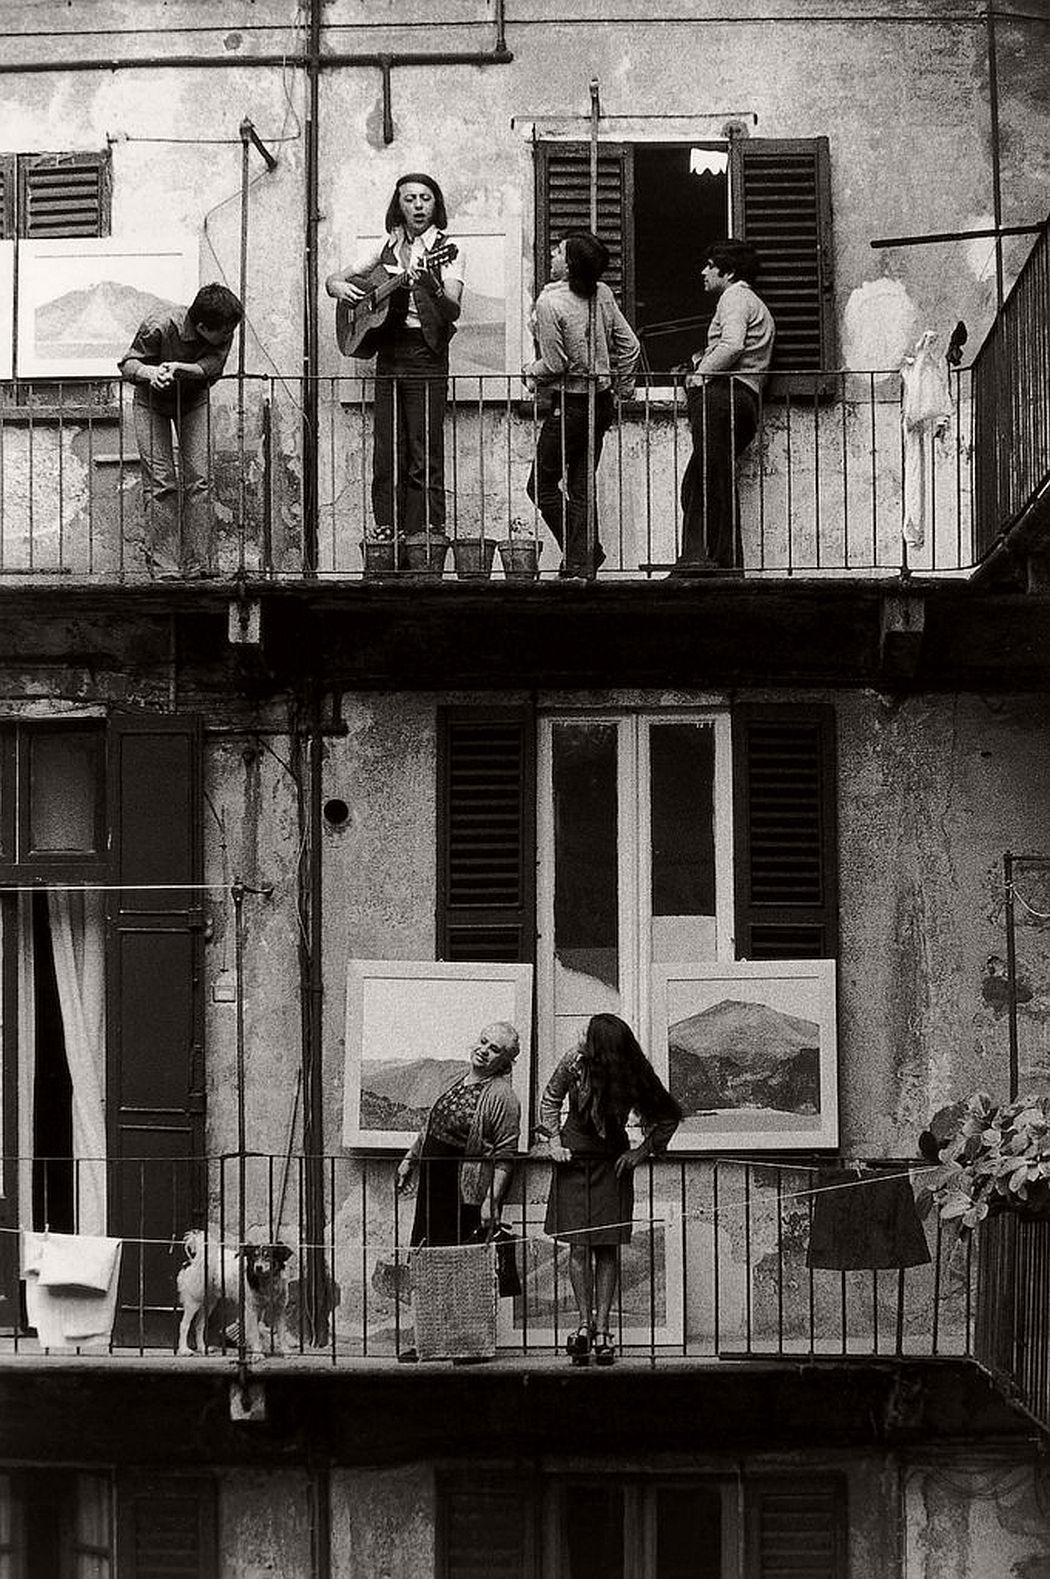 gianni-berengo-gardin-everyday-life-in-italy-1960s-17